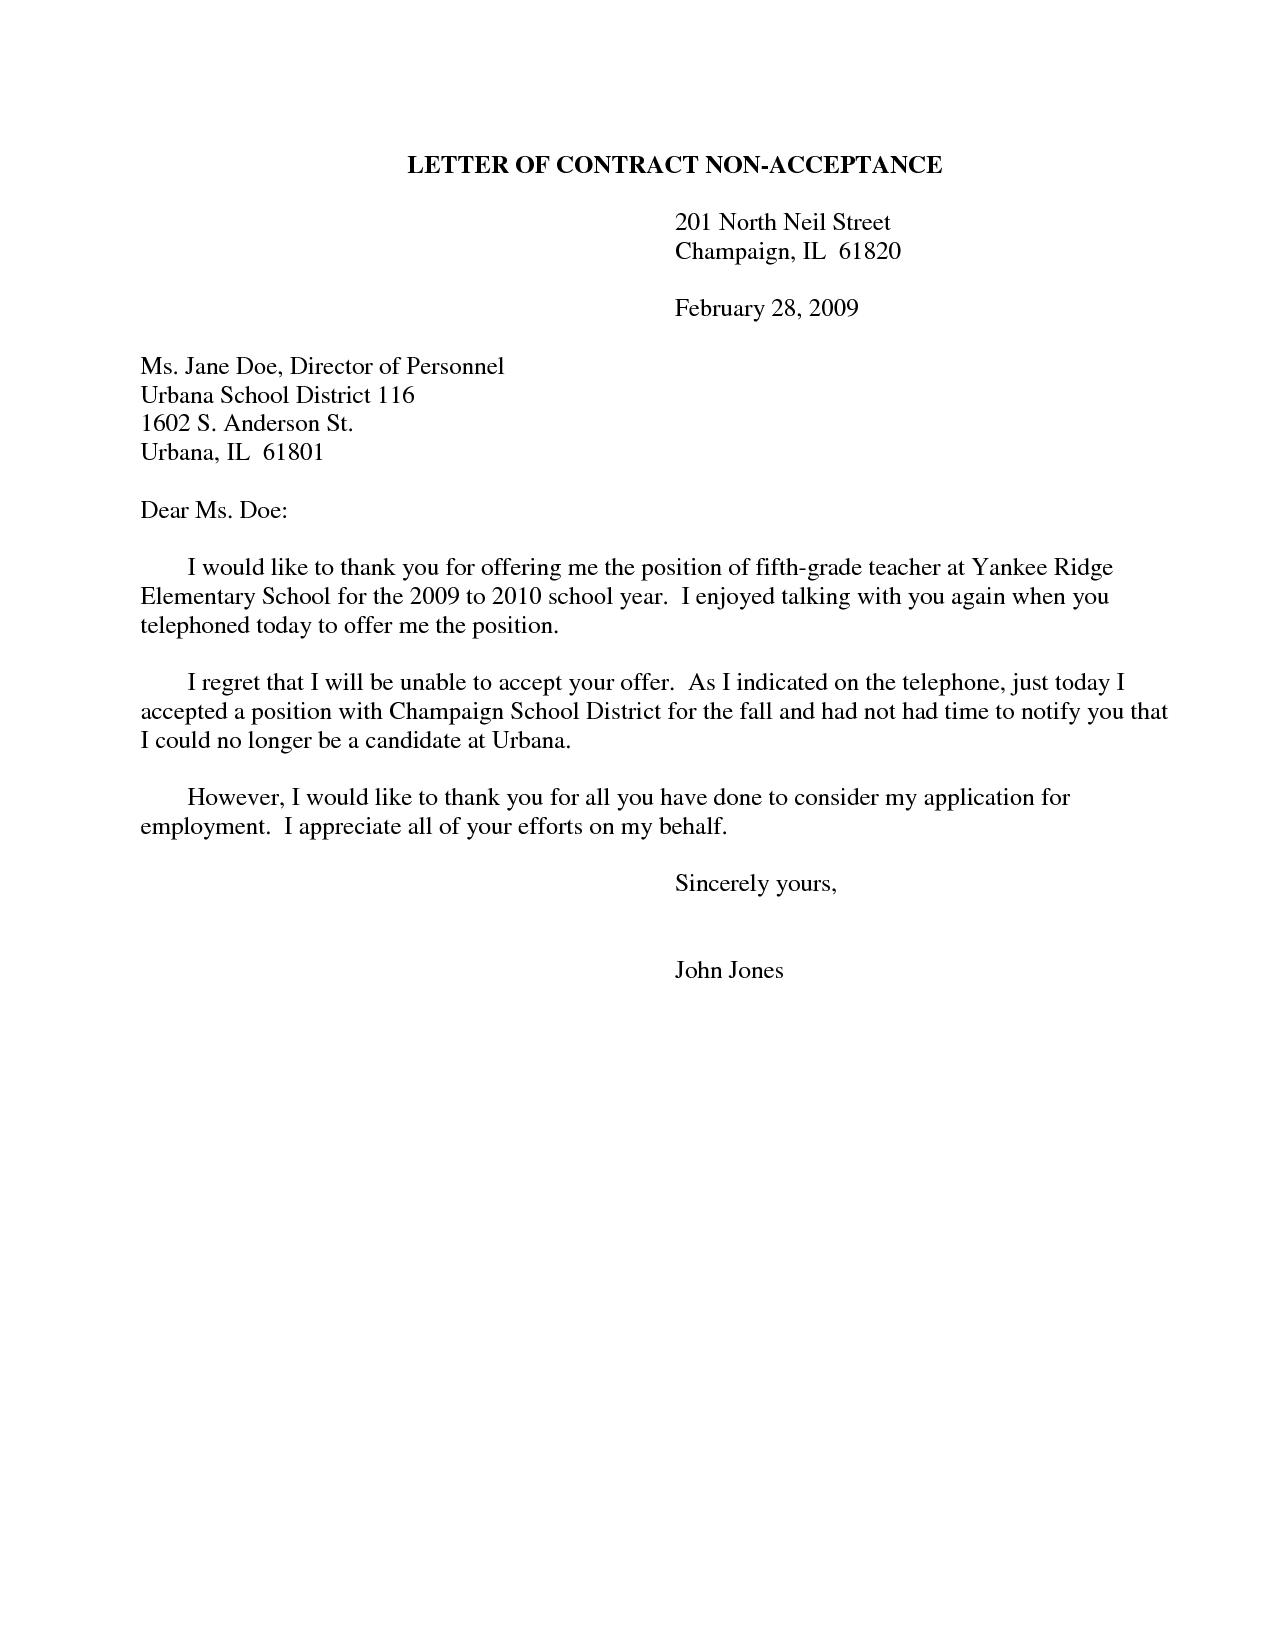 International letter format examples fresh best s of army letter commendation letter format alan noscrapleftbehind co commendation letter format military cover letter samples alan noscrapleftbehind co military cover spiritdancerdesigns Images